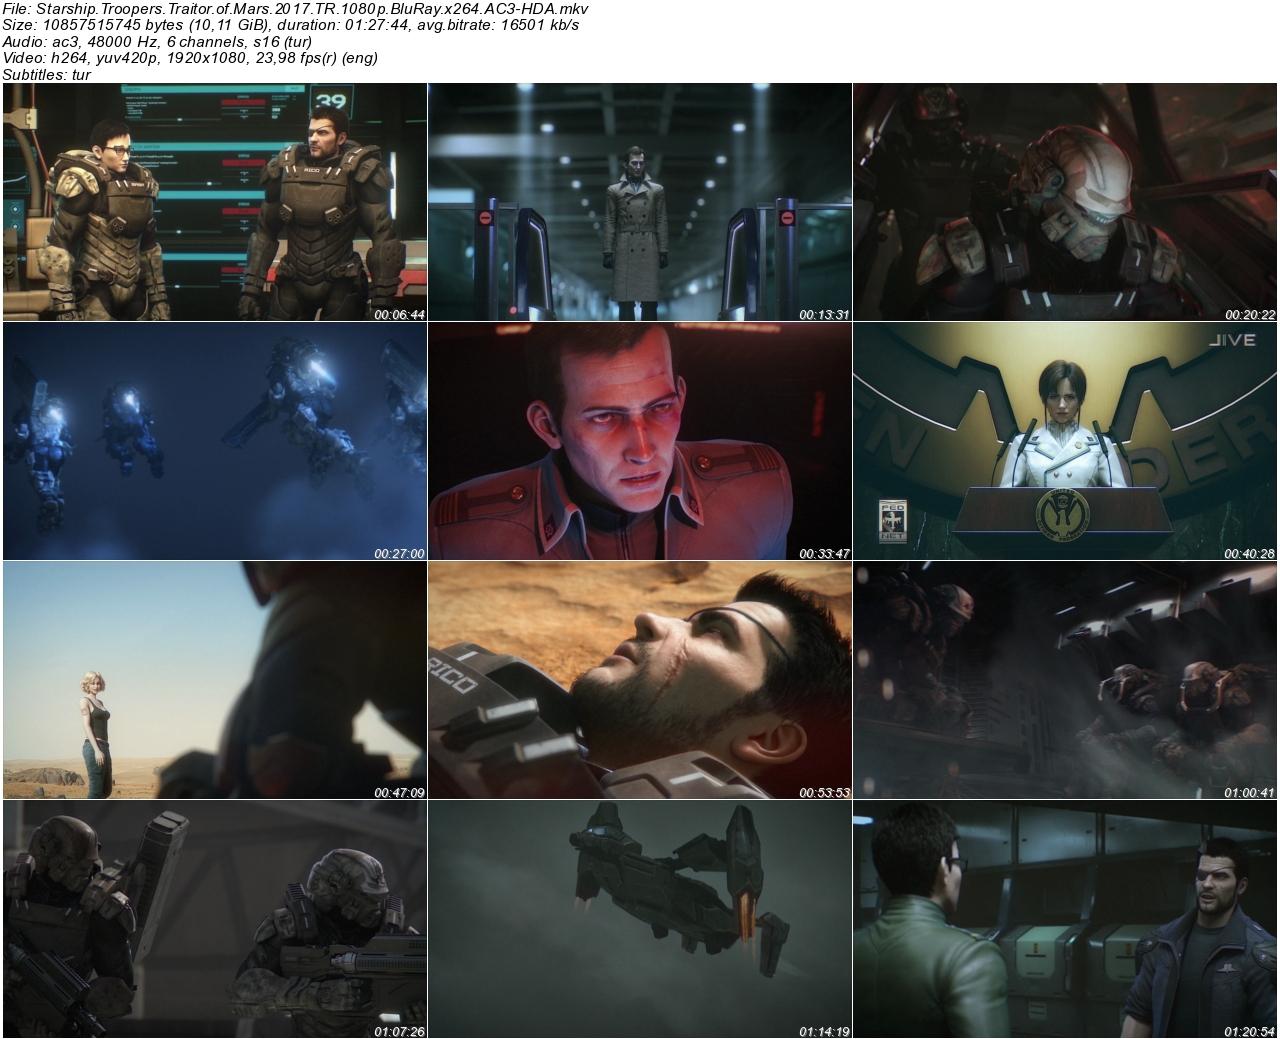 Starship Troopers Traitor of Mars 2017 - 1080p 720p 480p - Türkçe Dublaj Tek Link indir